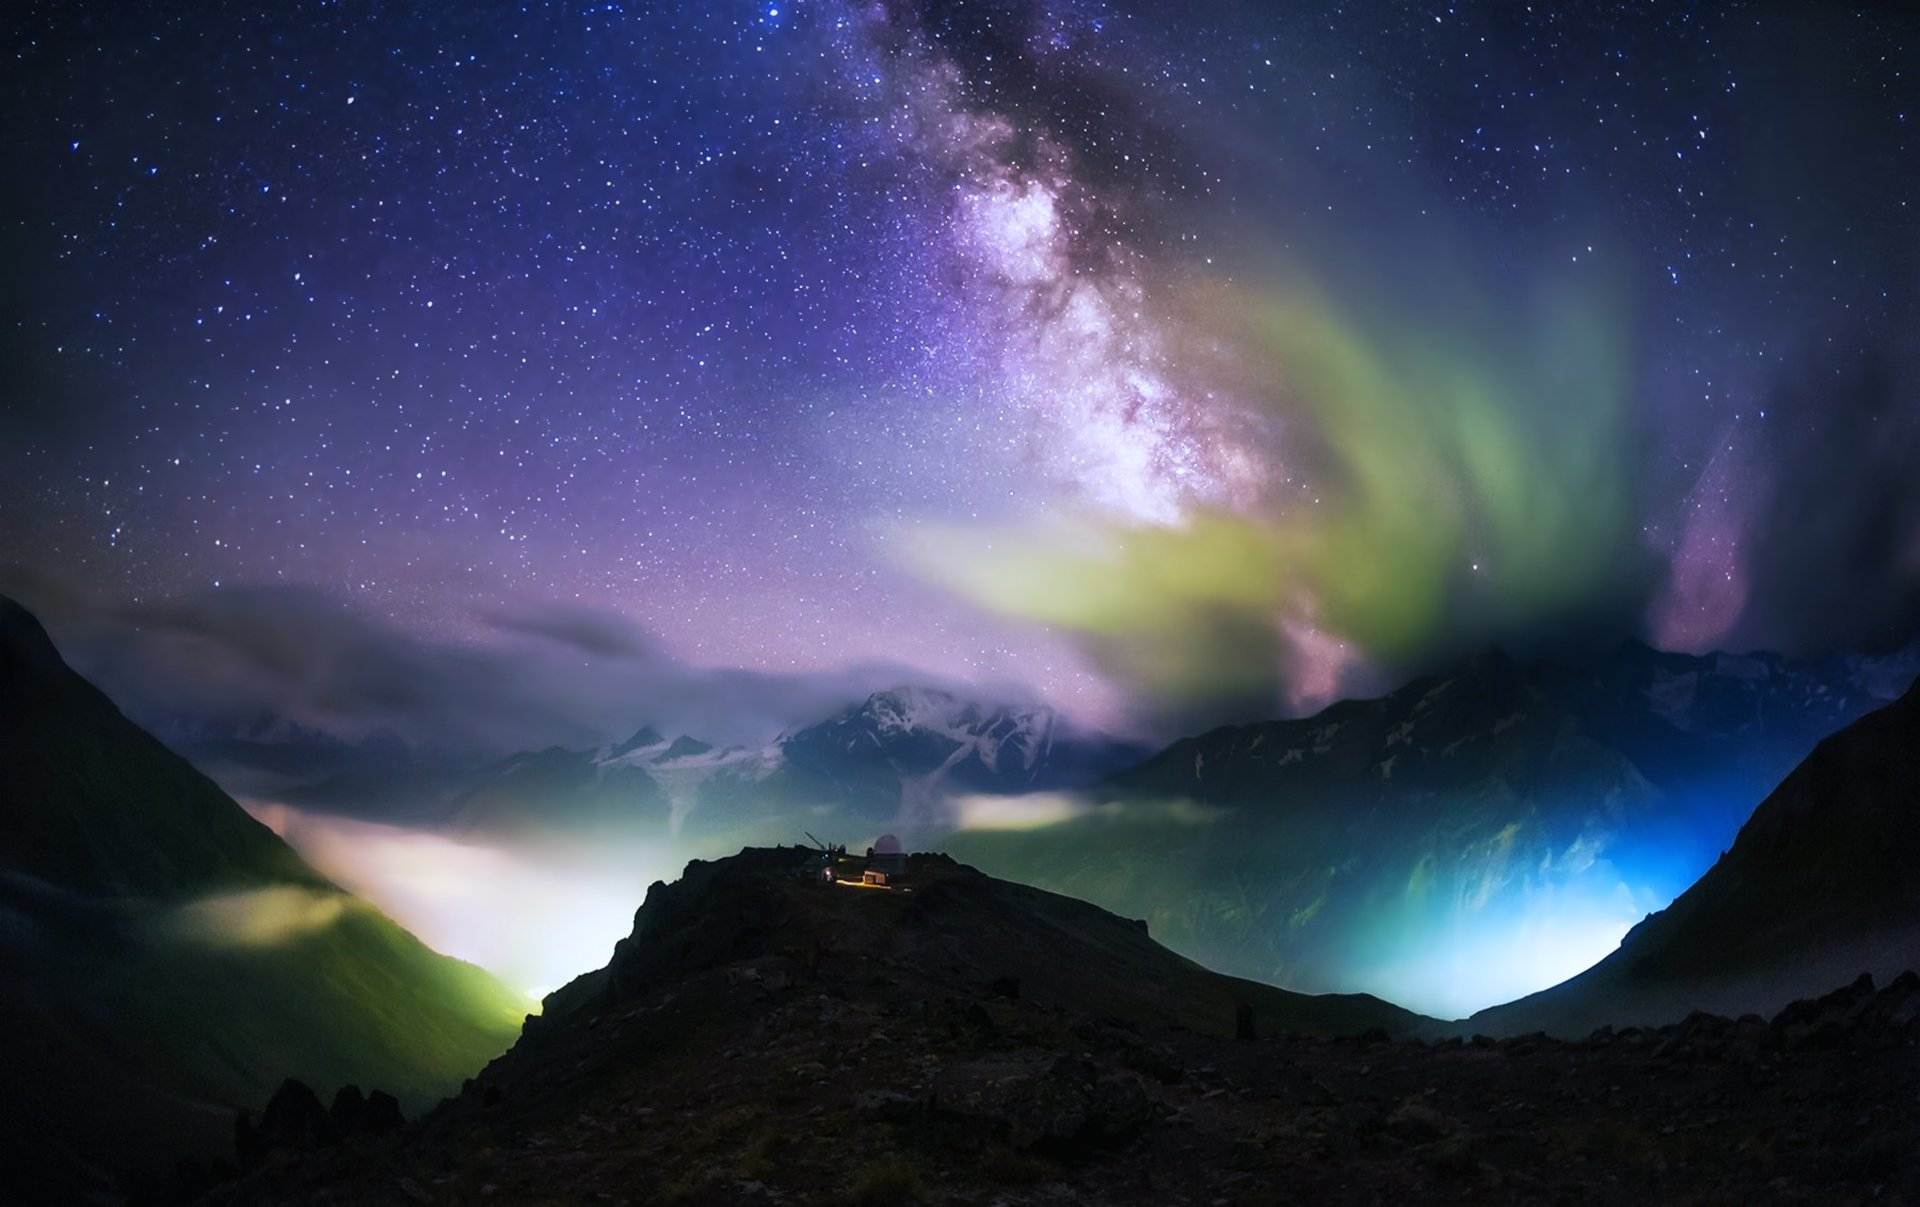 Sci Fi - Milky Way  Galaxy Sky Stars Sci Fi Mountain Colorful Cloud Landscape Earth Nature Wallpaper